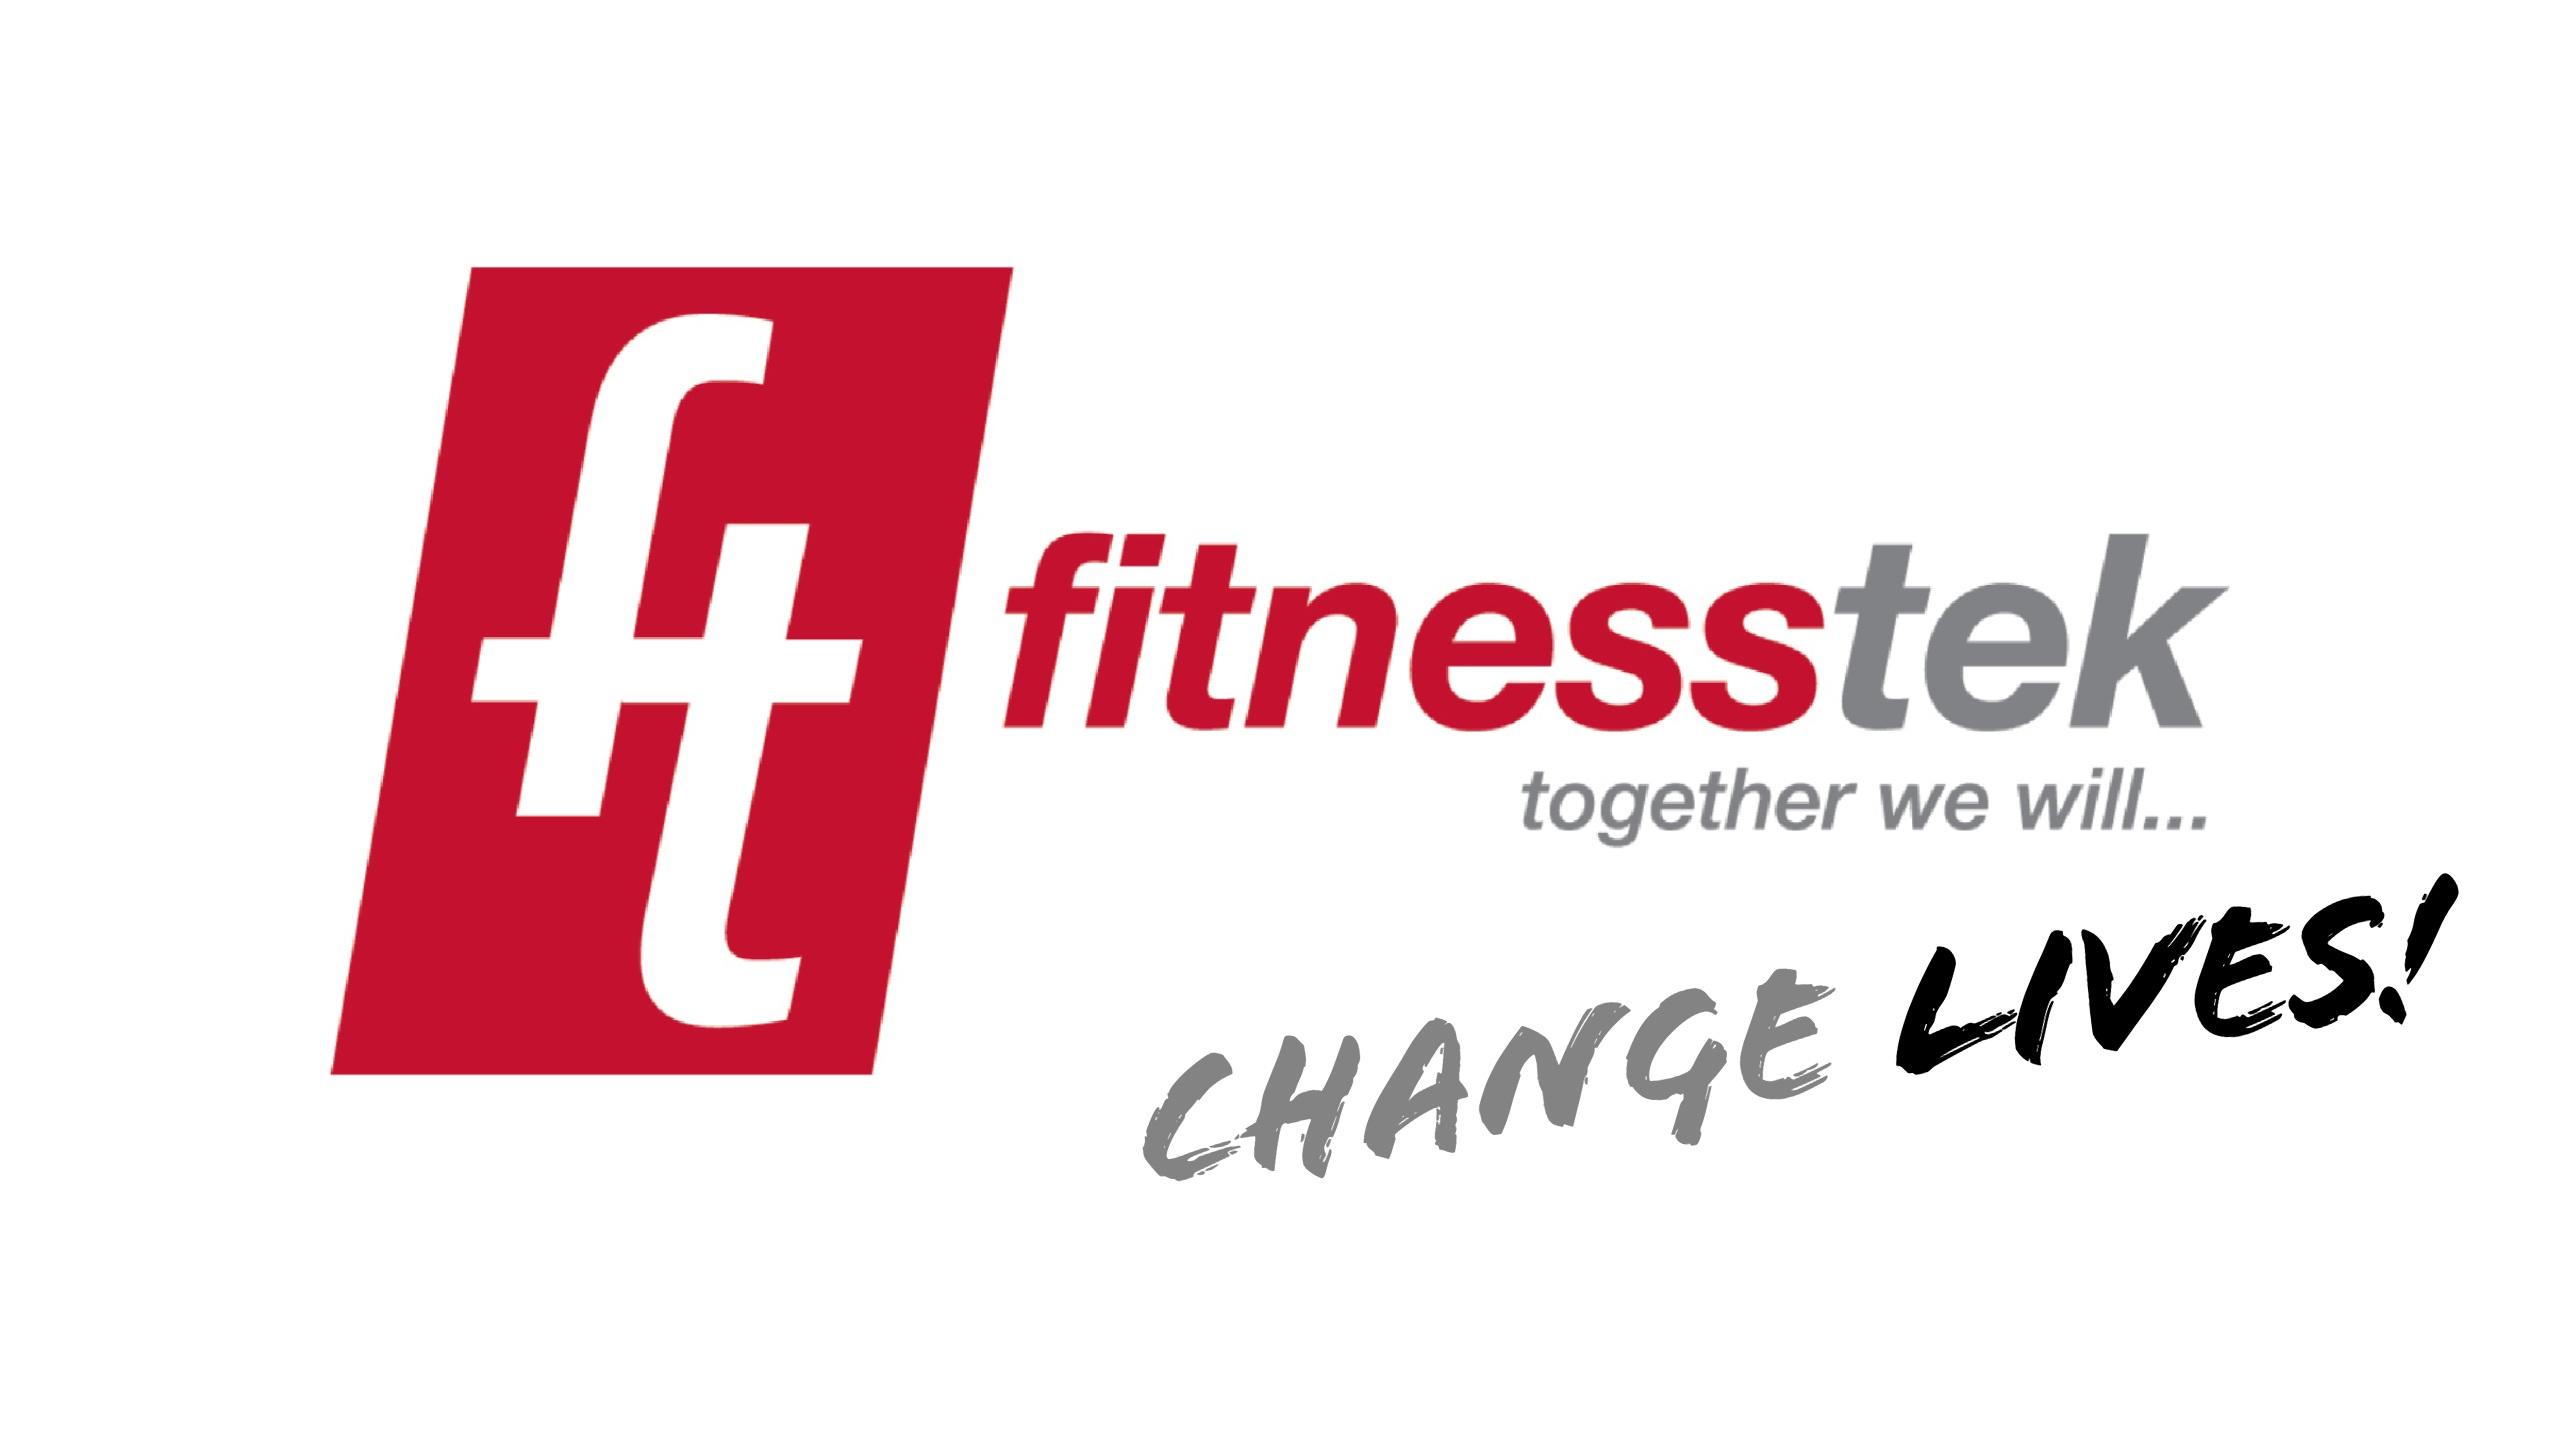 Fitness-Tek Personal Training Studio